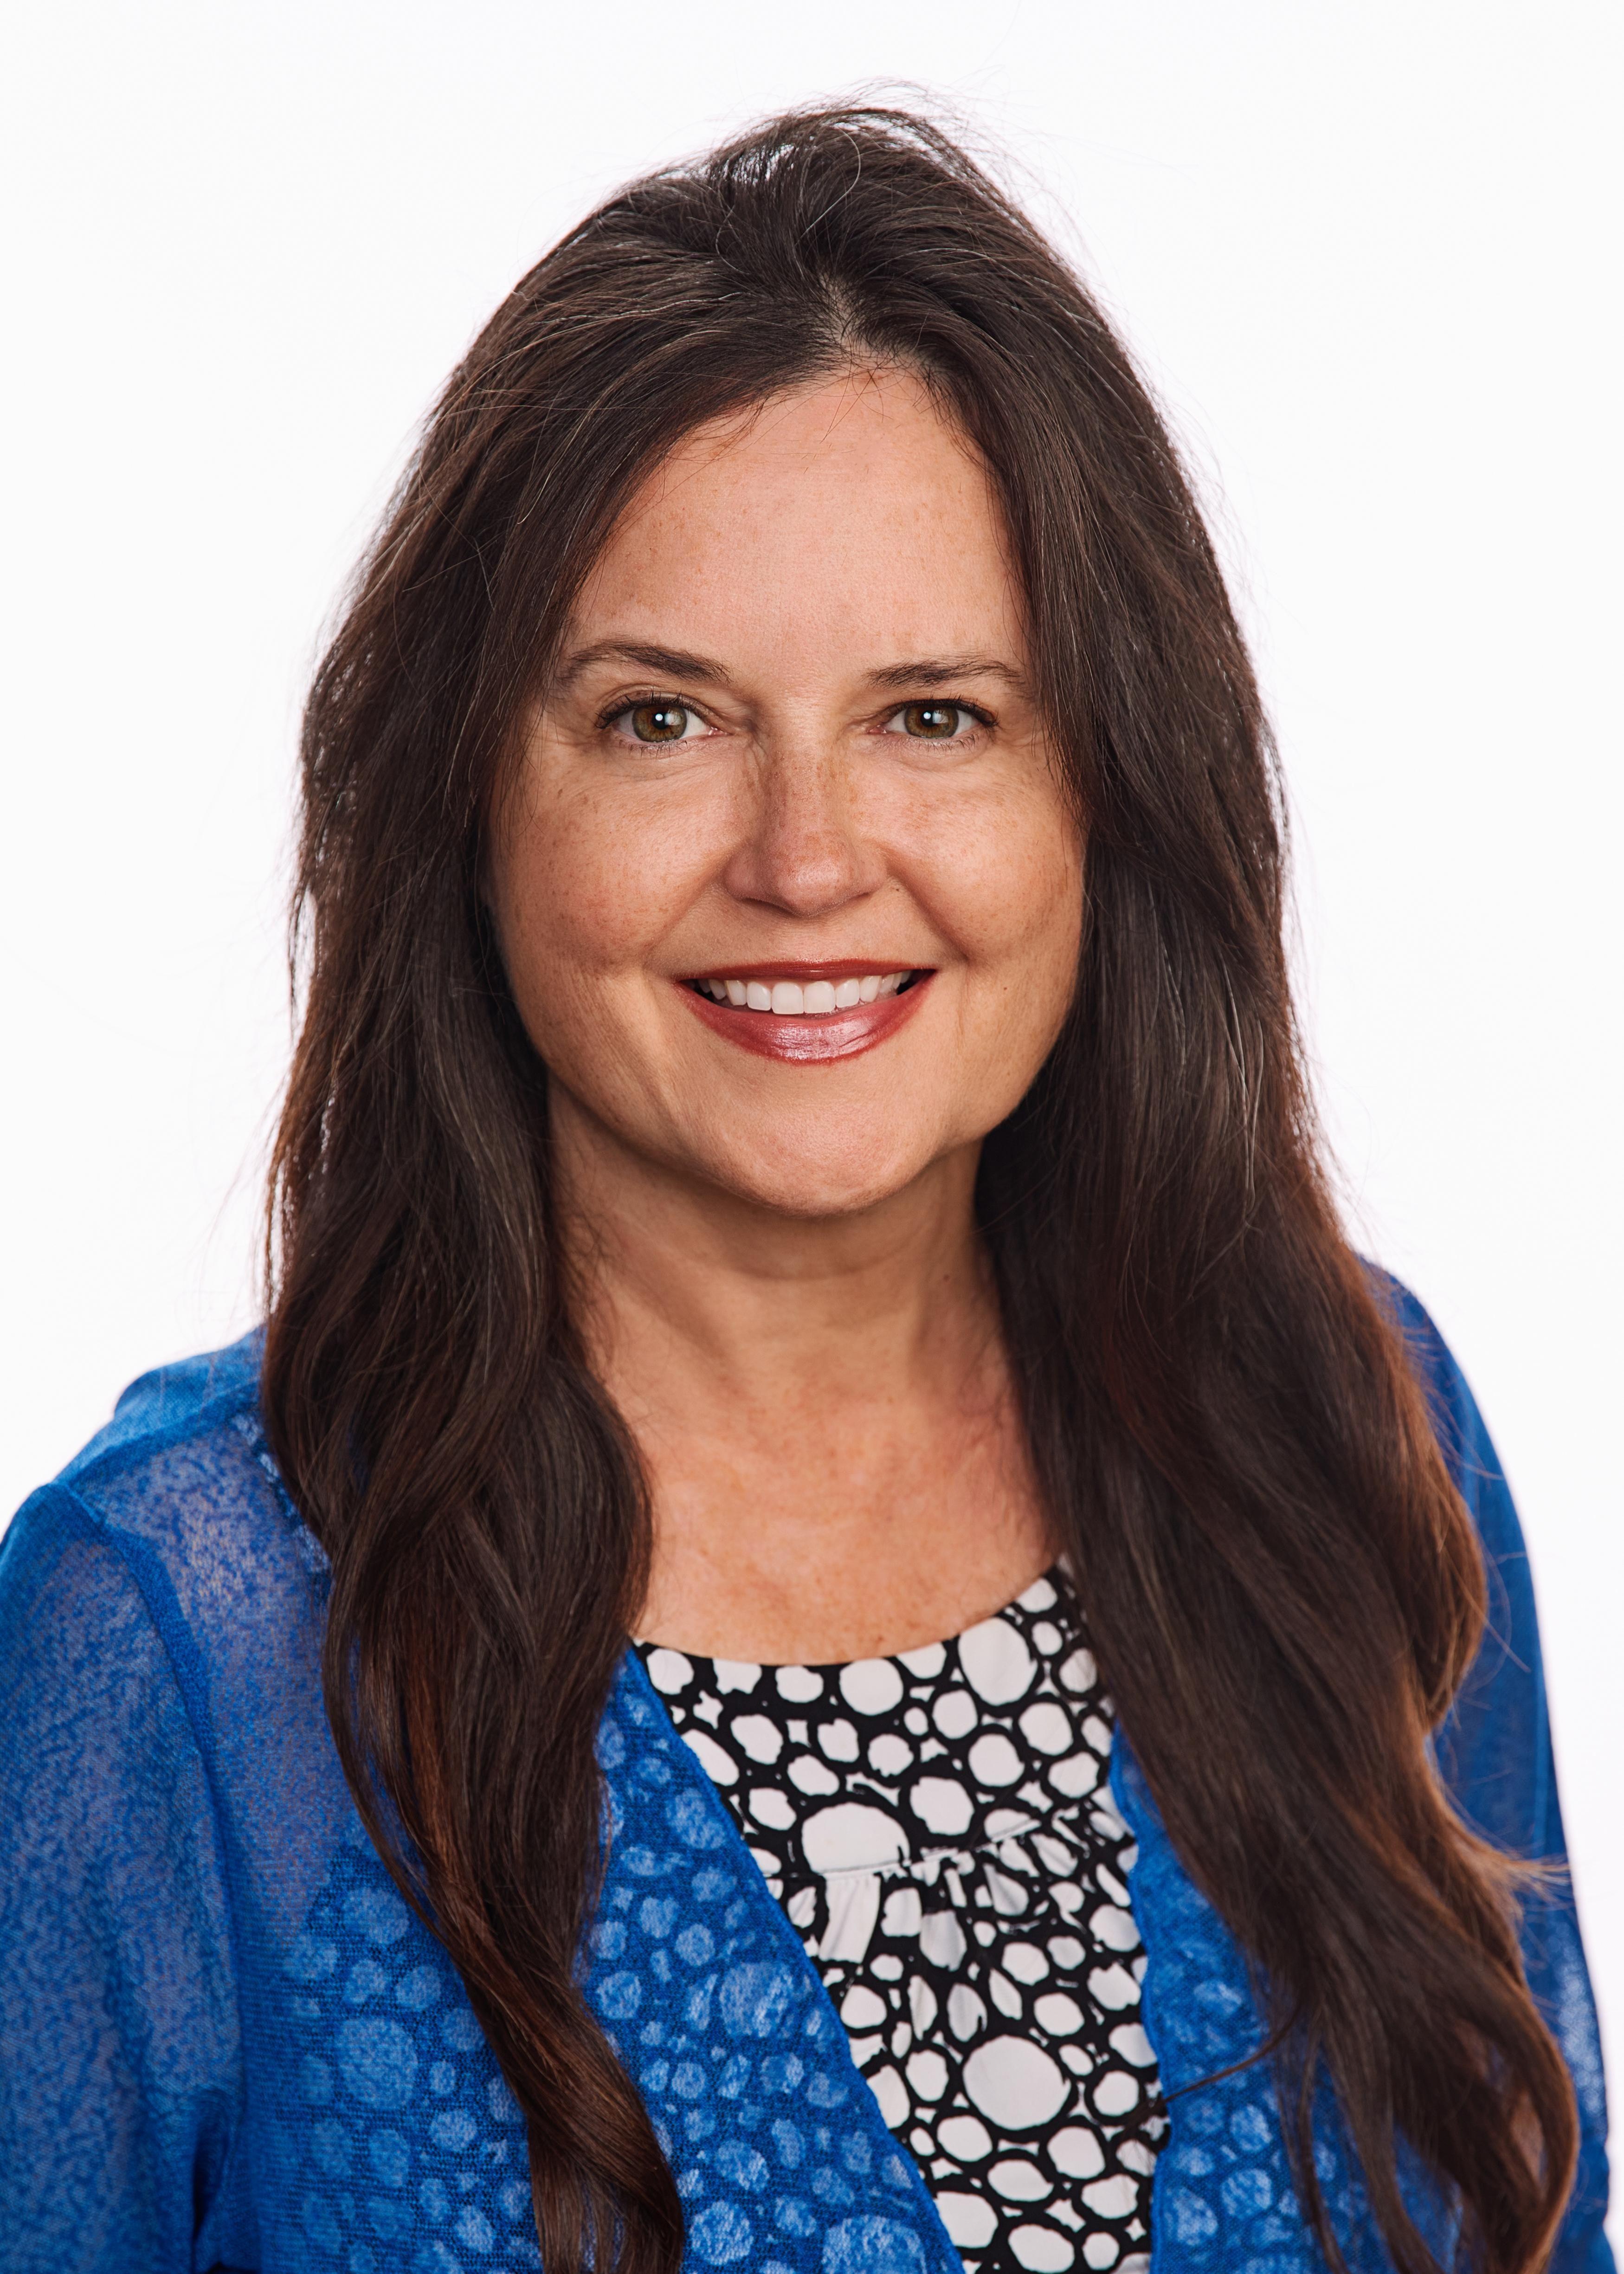 Dr. Samantha Humke